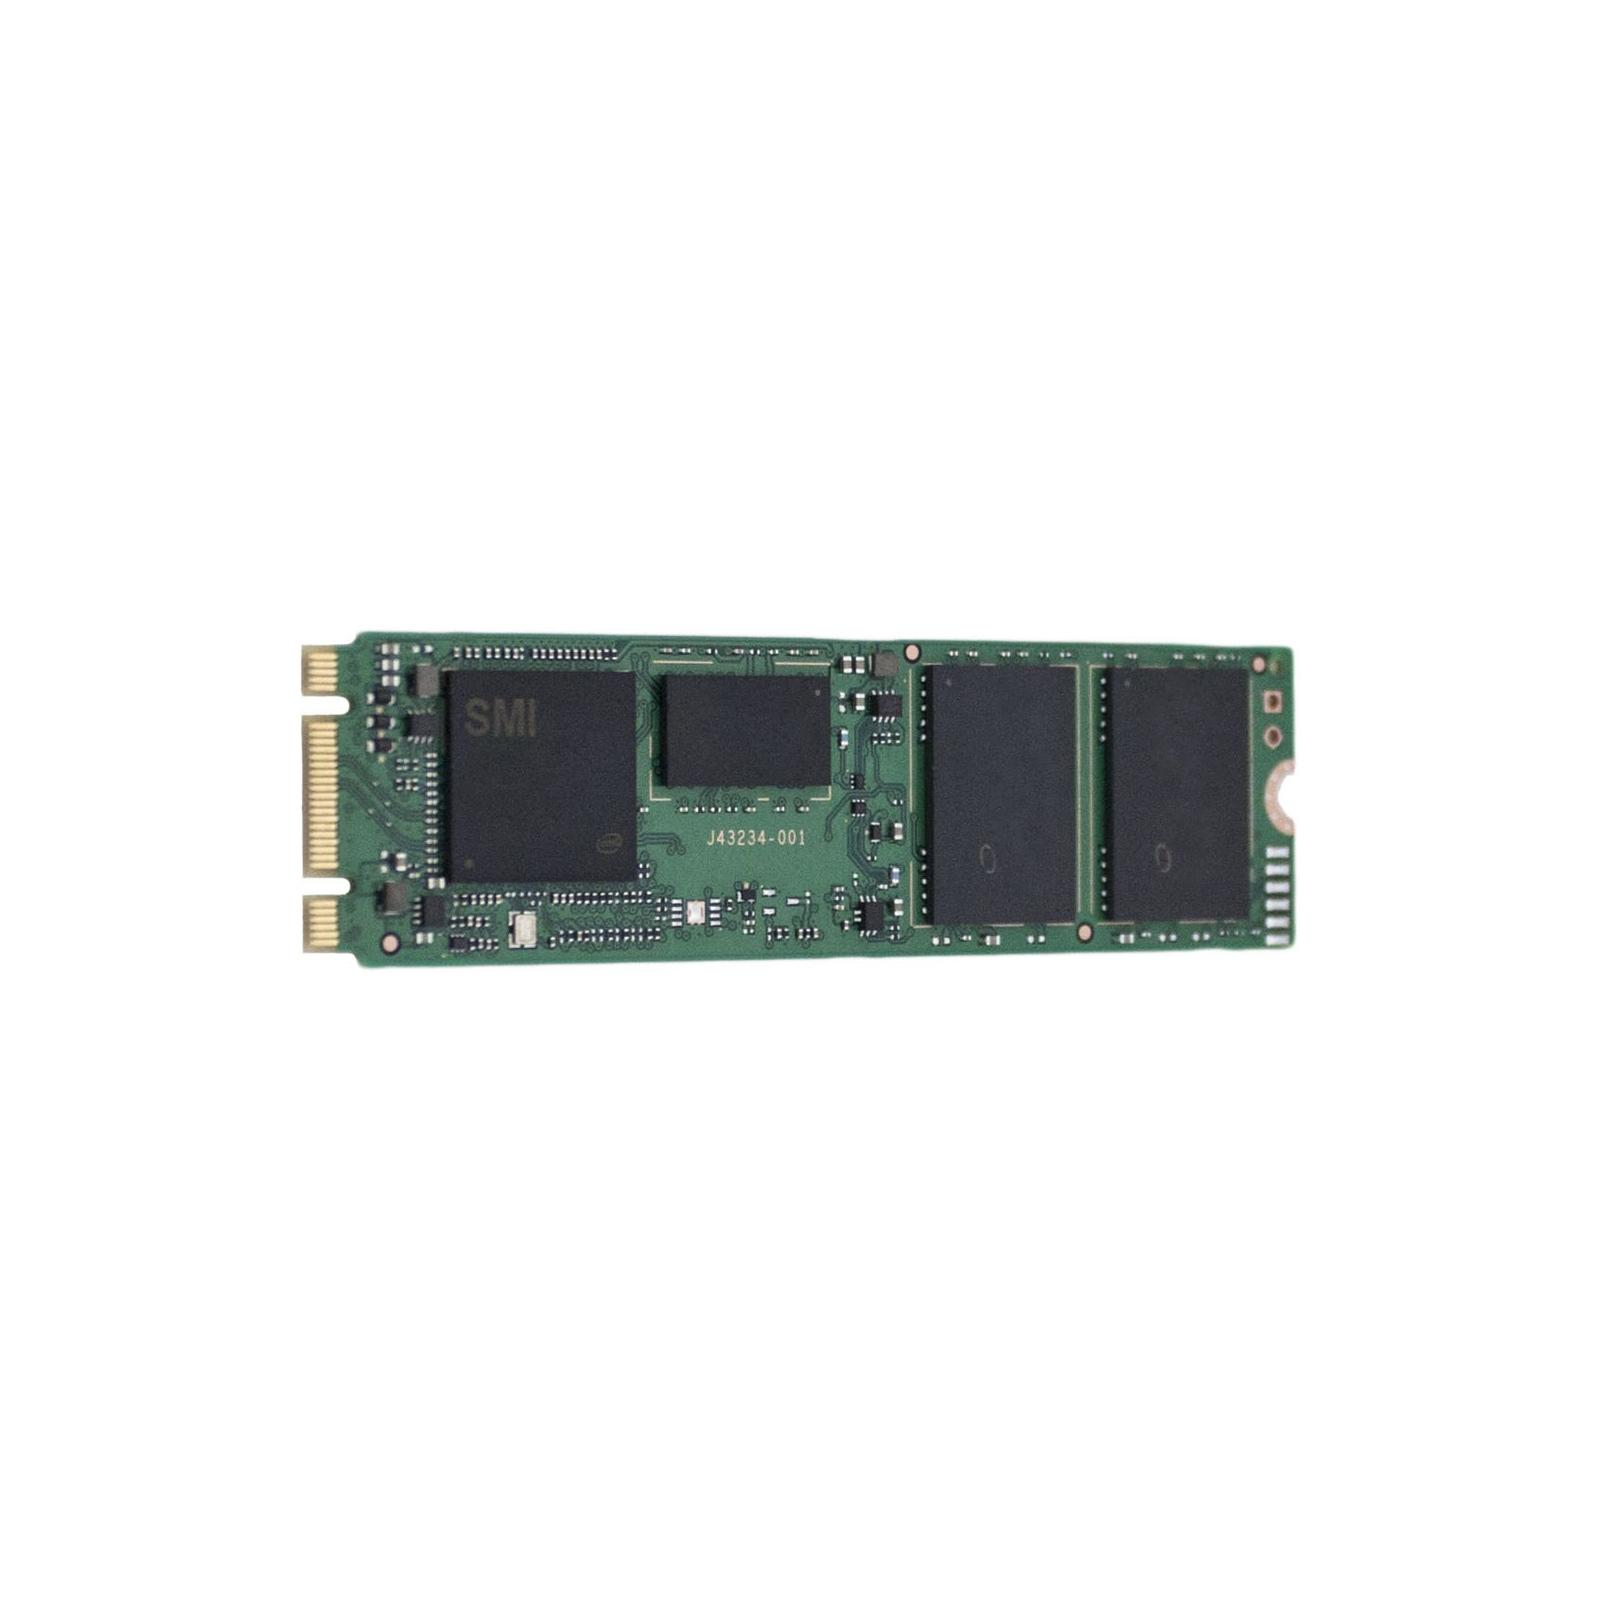 Накопитель SSD M.2 2280 128GB INTEL (SSDSCKKW128G8X1) изображение 3